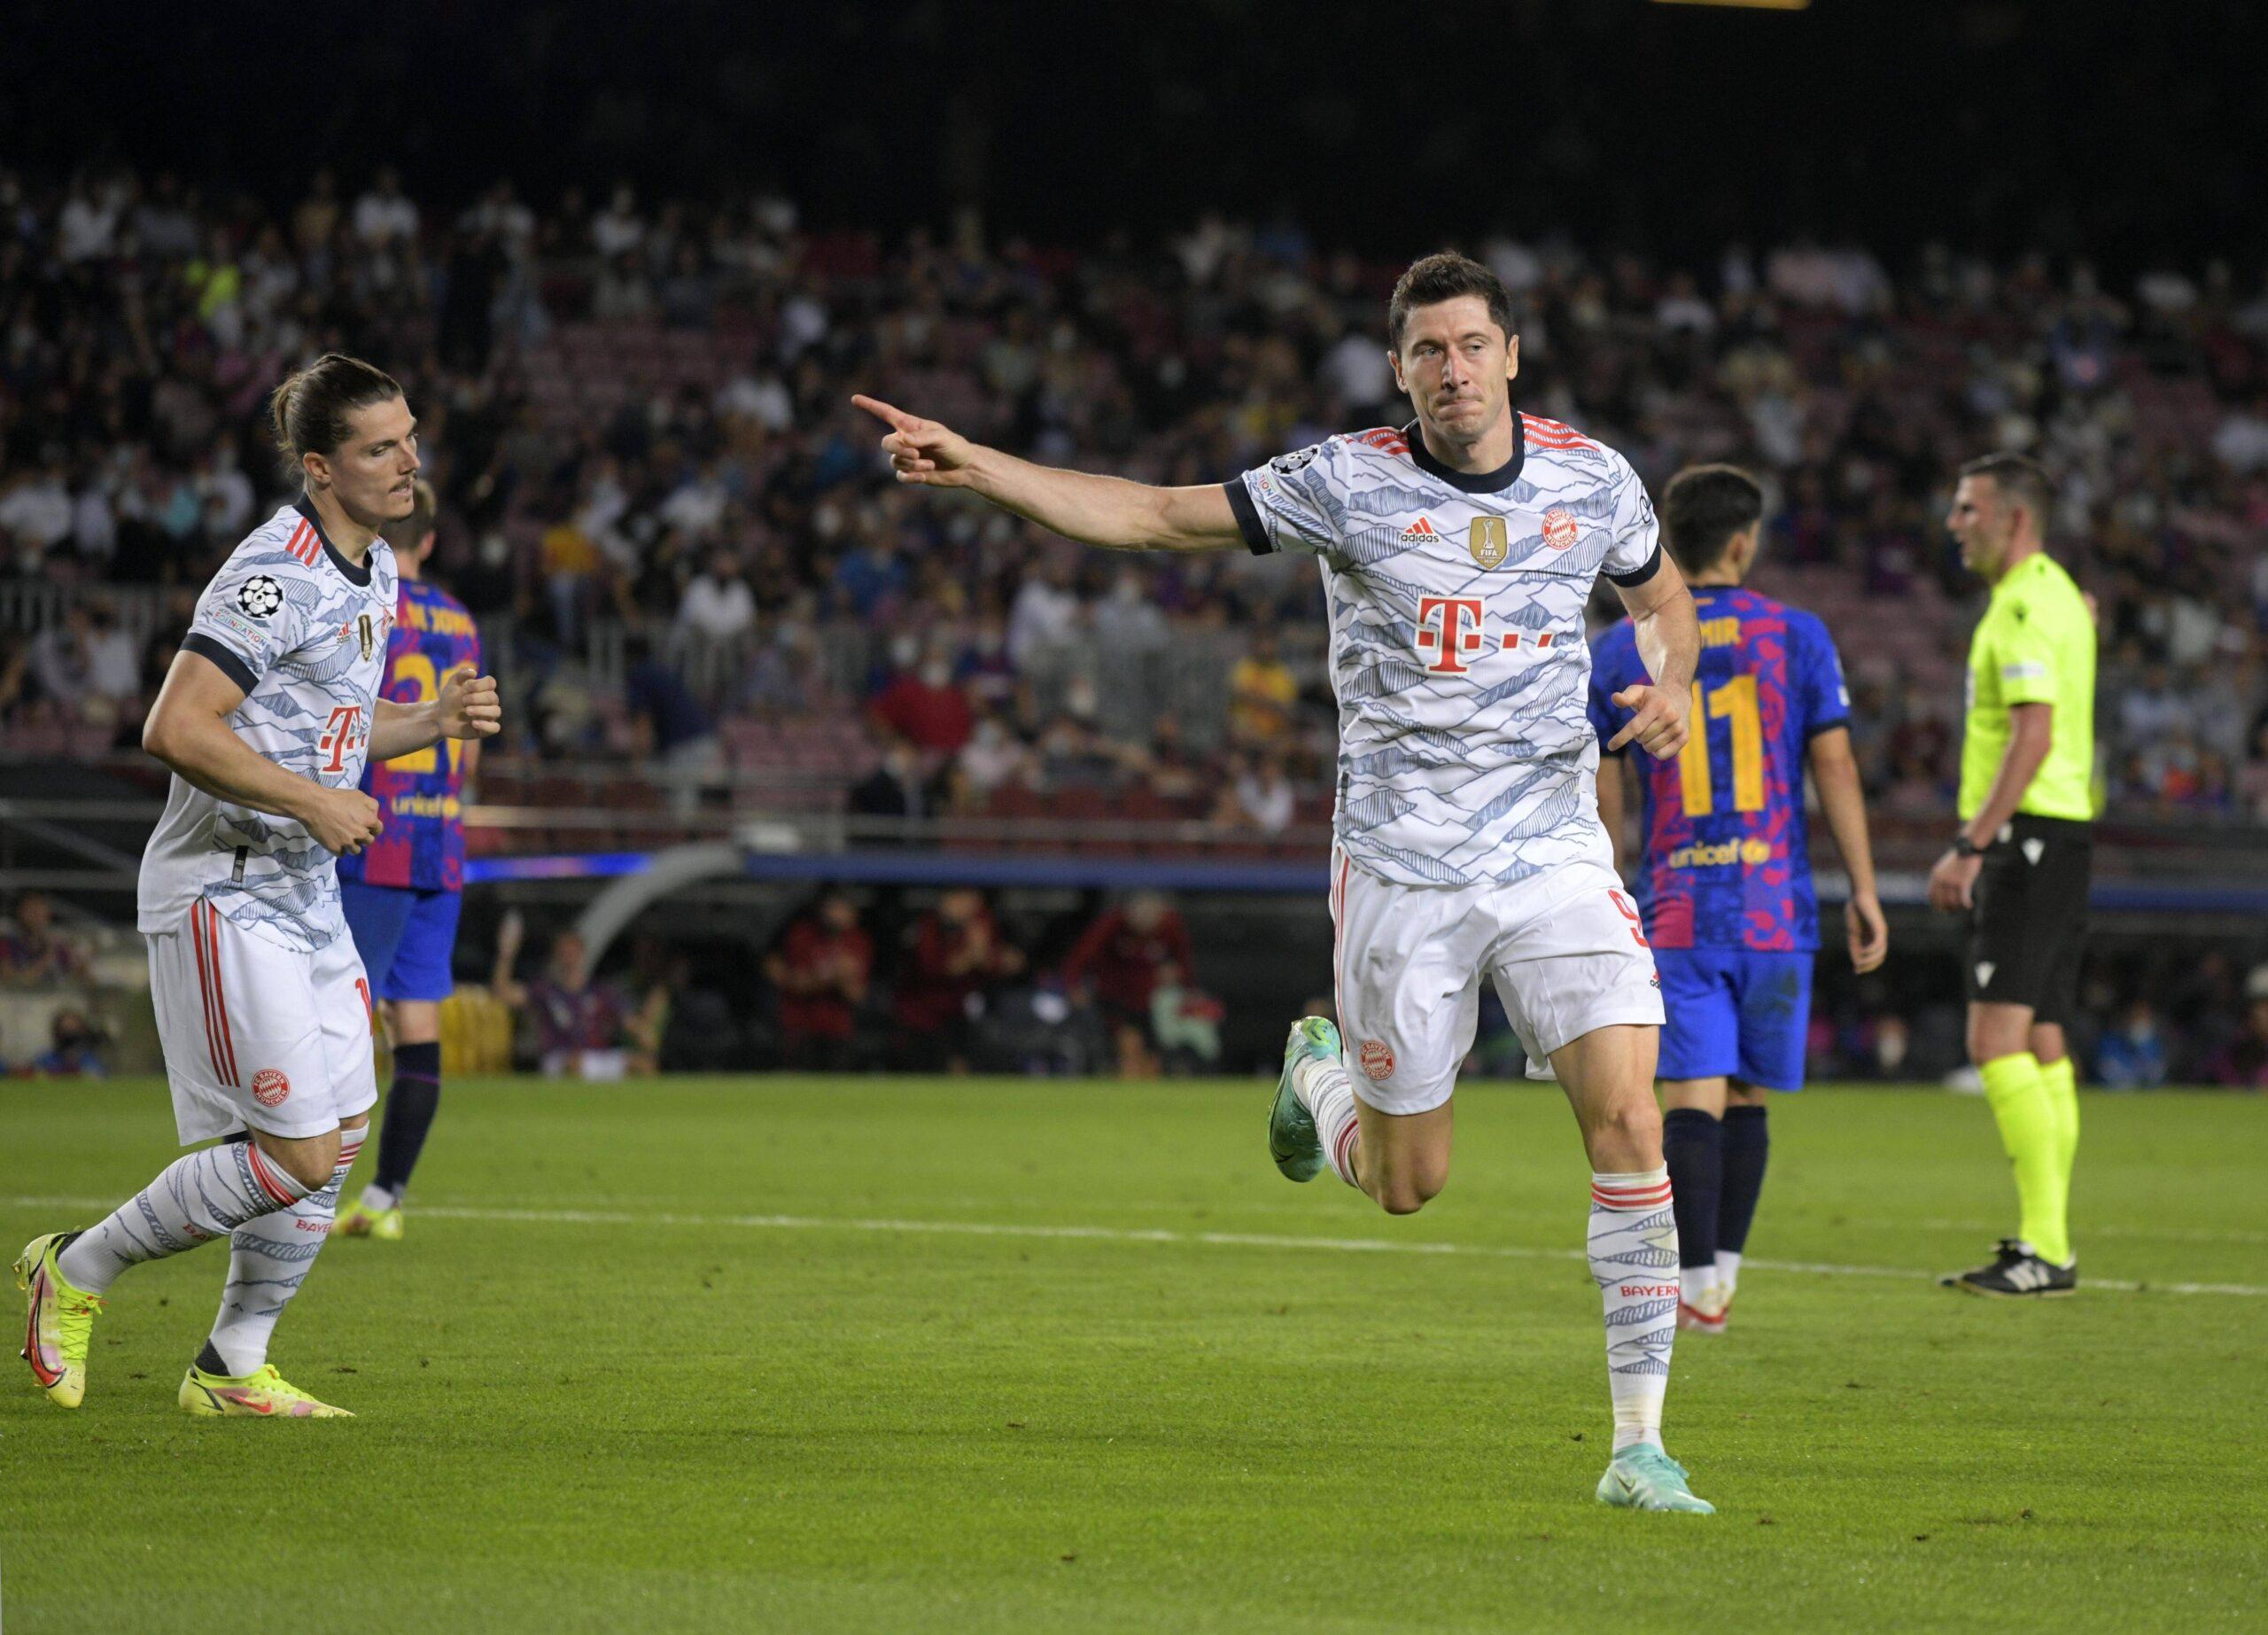 Robert Lewandowski gritó presente en la goleada por 3:0 de FC Bayern München a FC Barcelona. Foto: Imago.